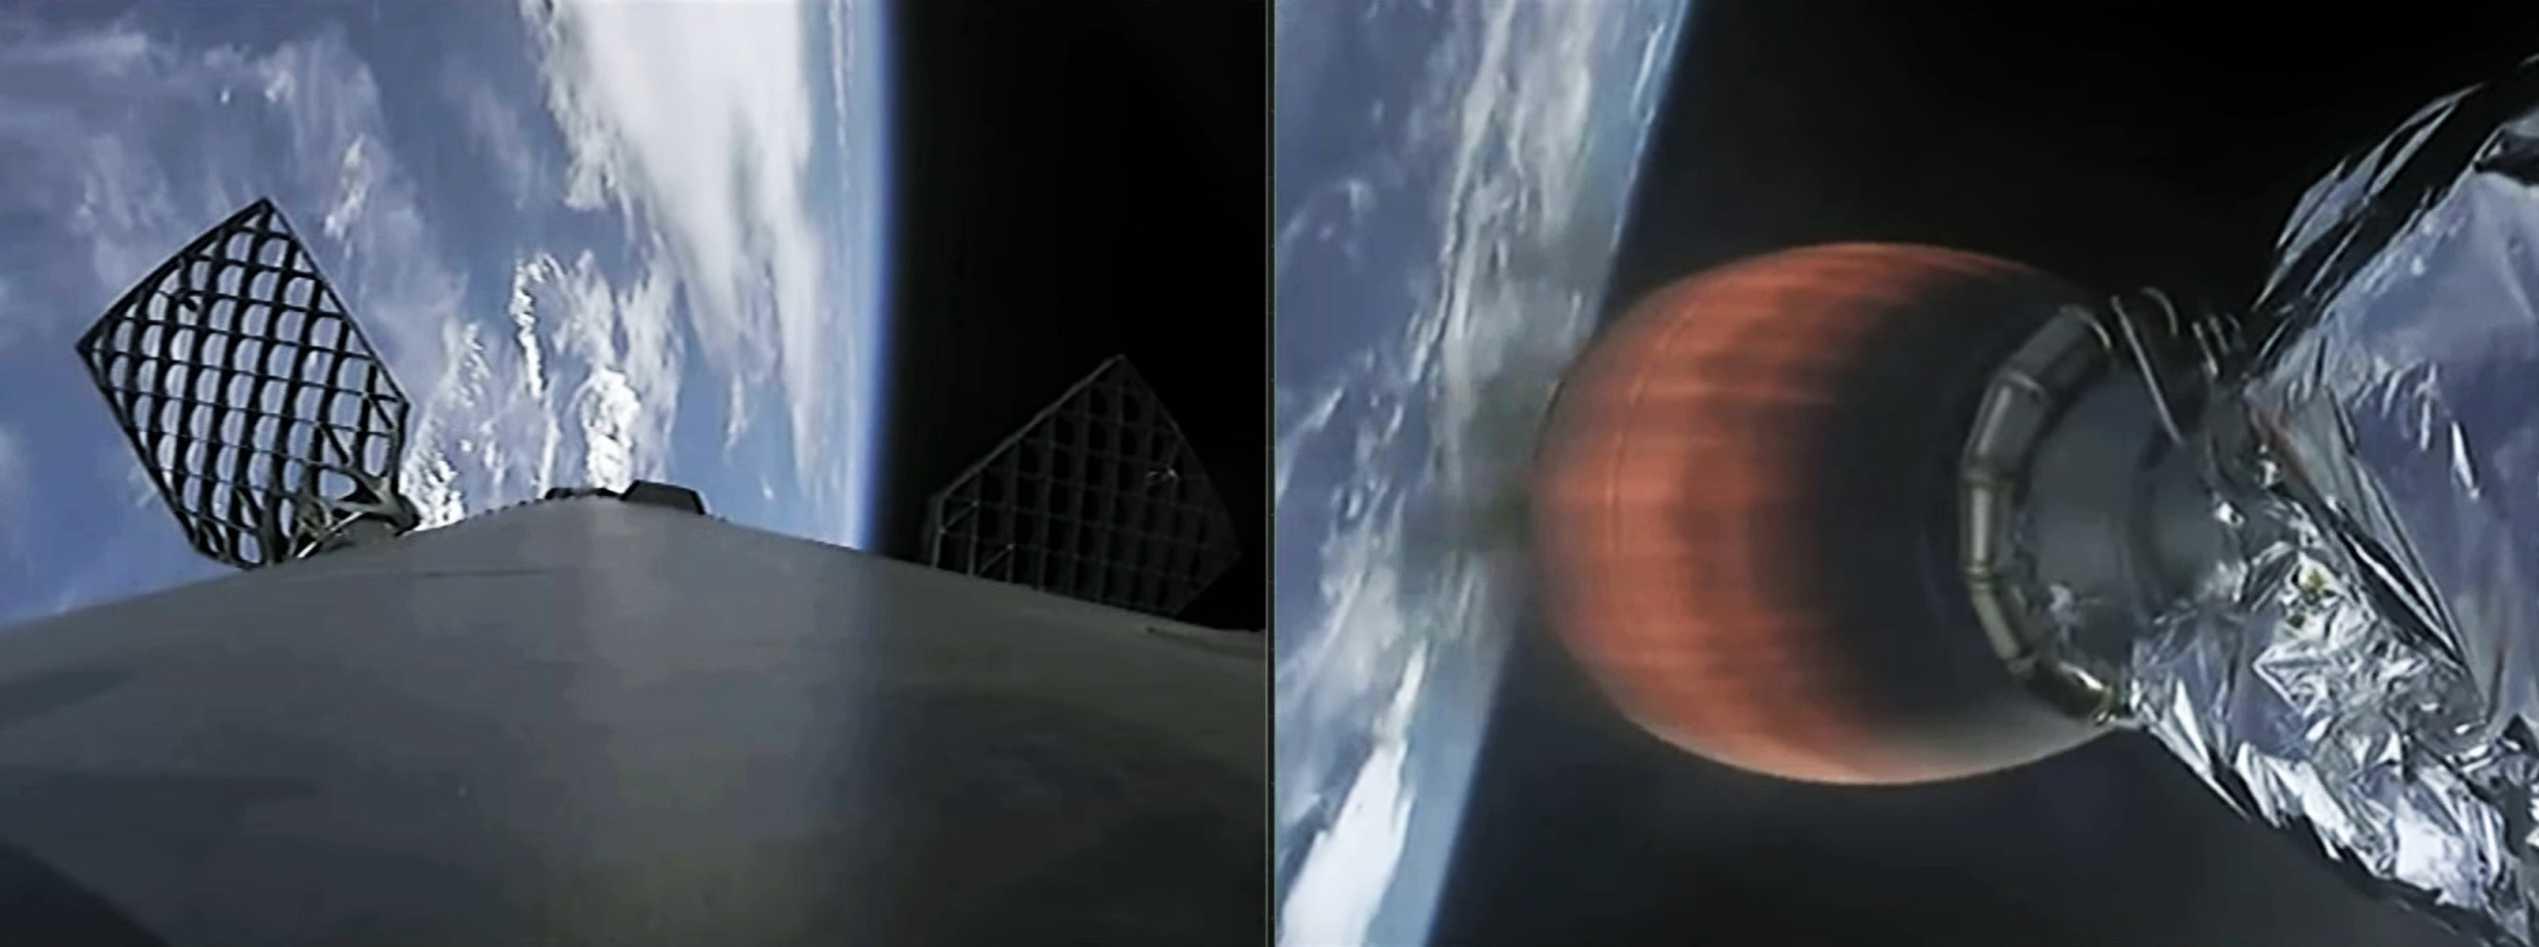 GPS III SV03 Falcon 9 B1060 webcast 063020 (SpaceX) 9 (c)